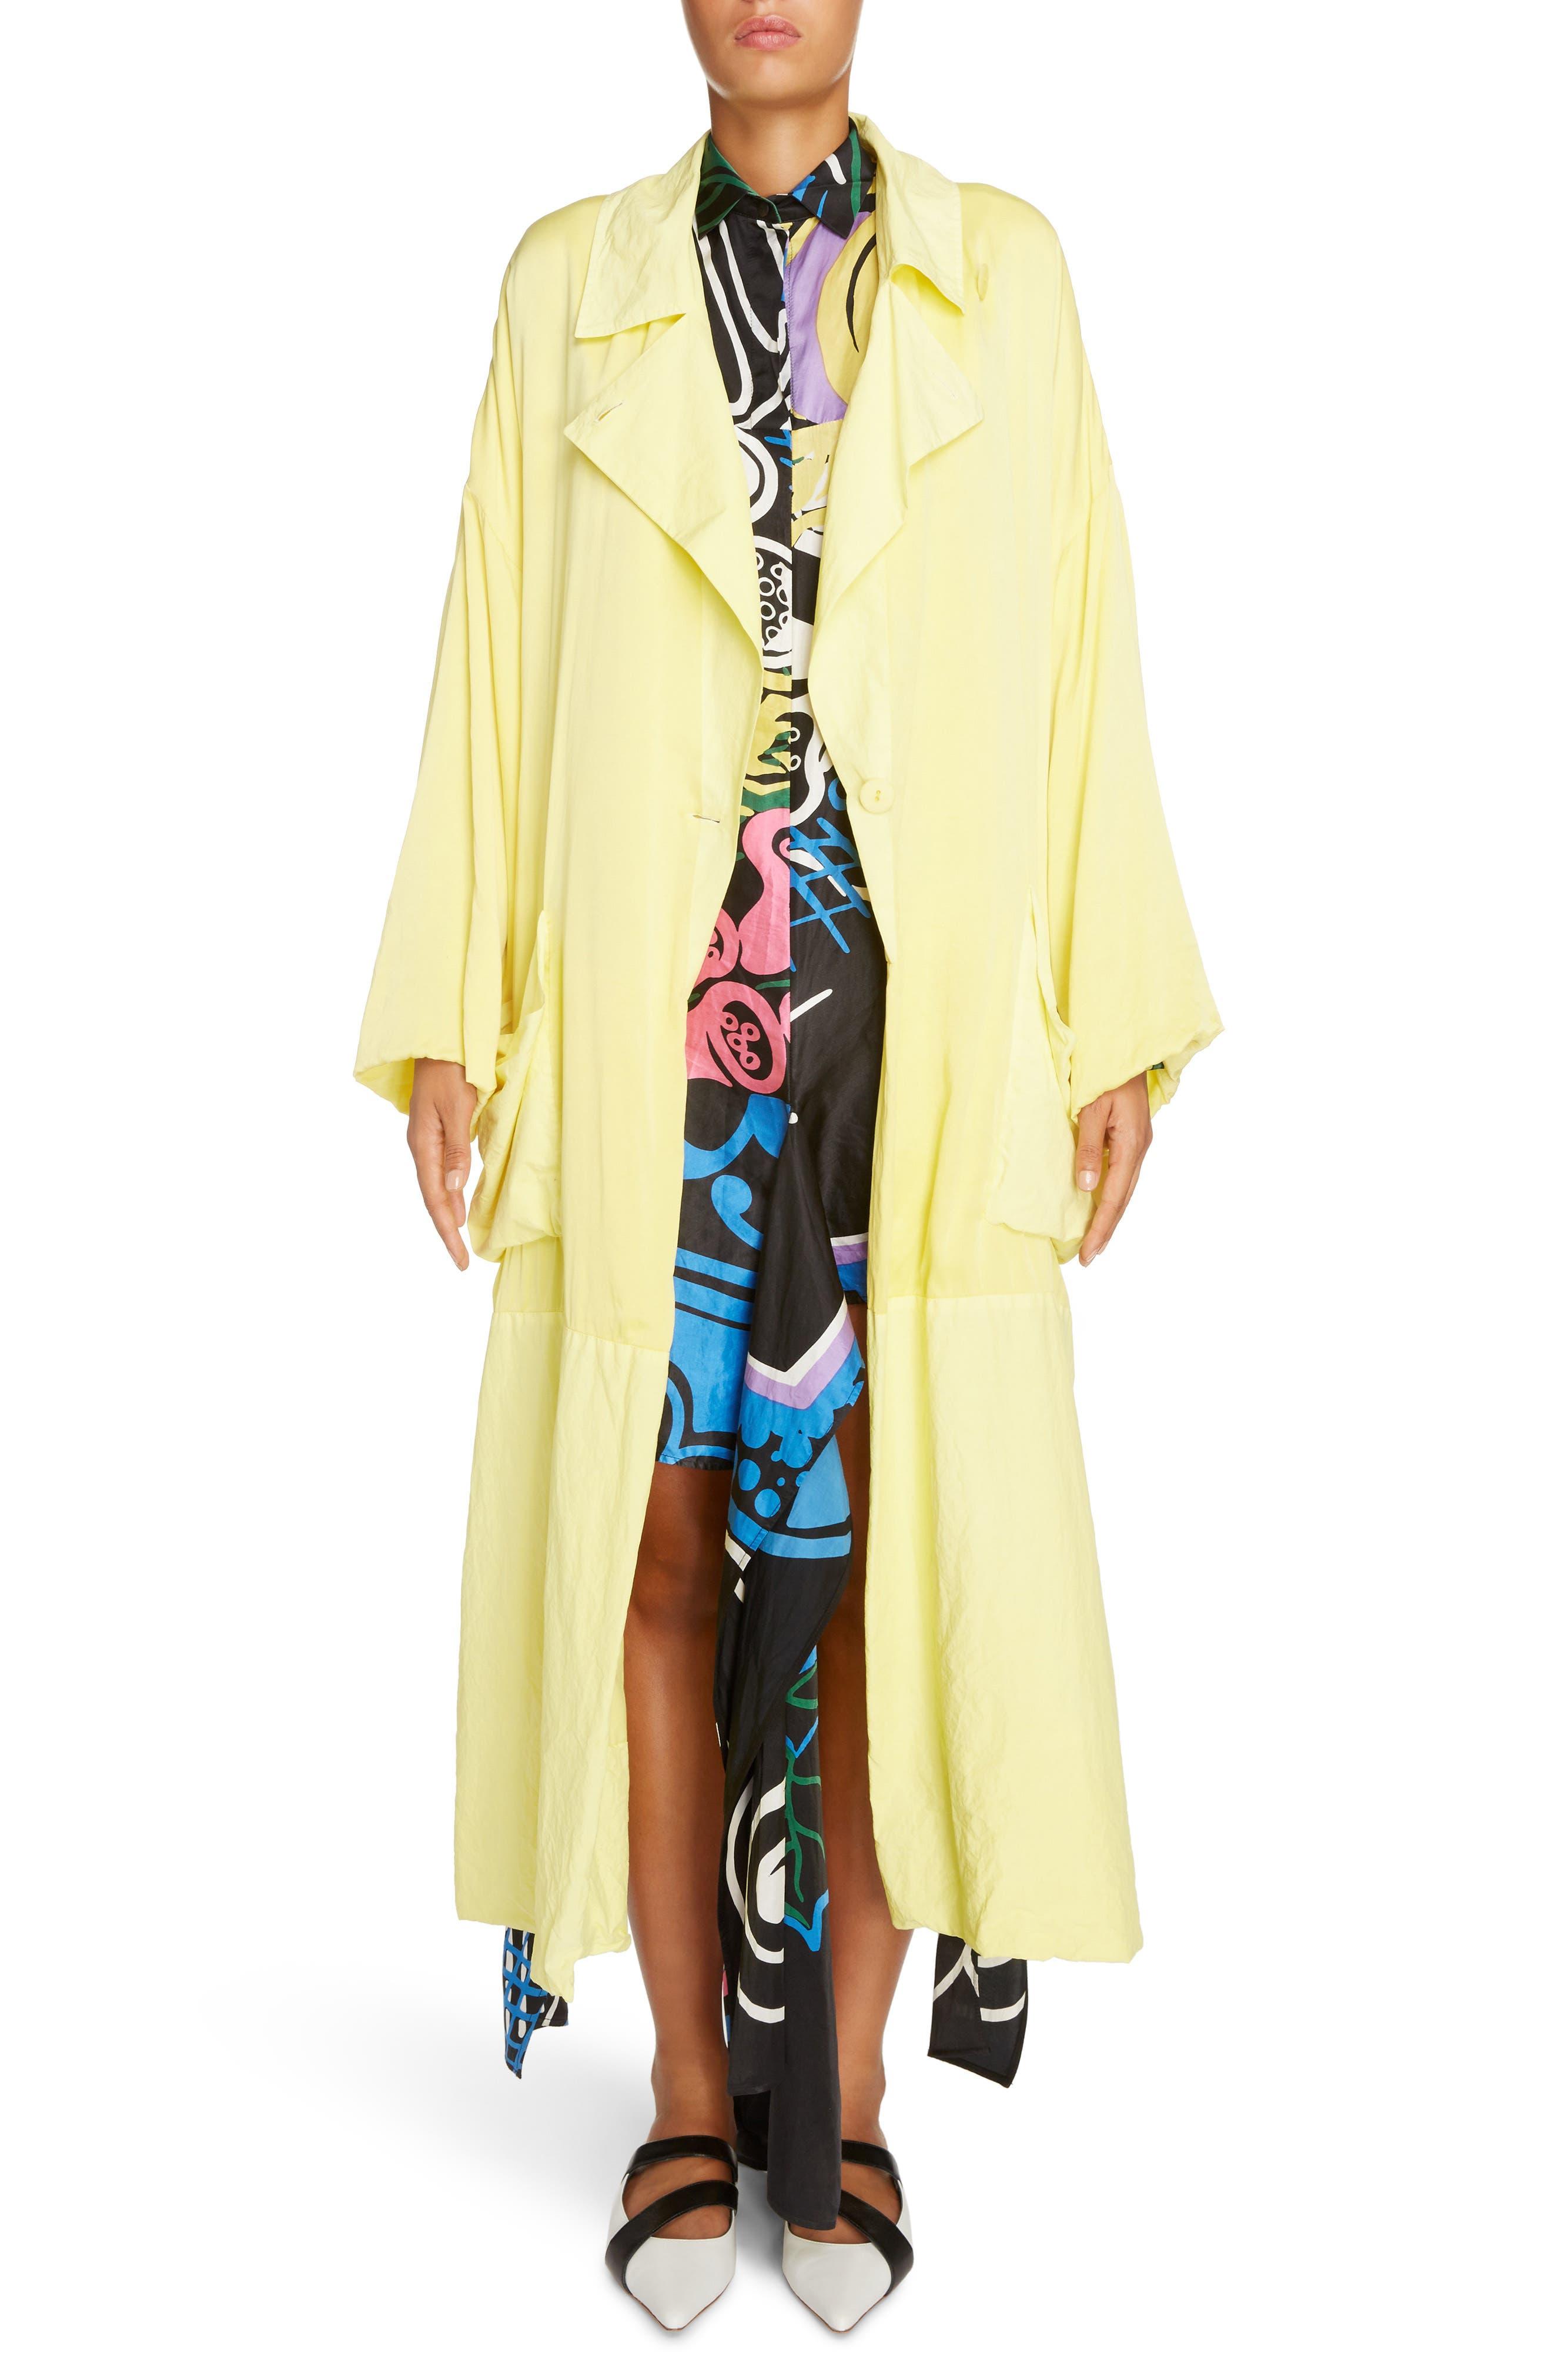 Foxglove Print Dress with Ribbon Detail,                             Alternate thumbnail 6, color,                             Black Foxglove Print